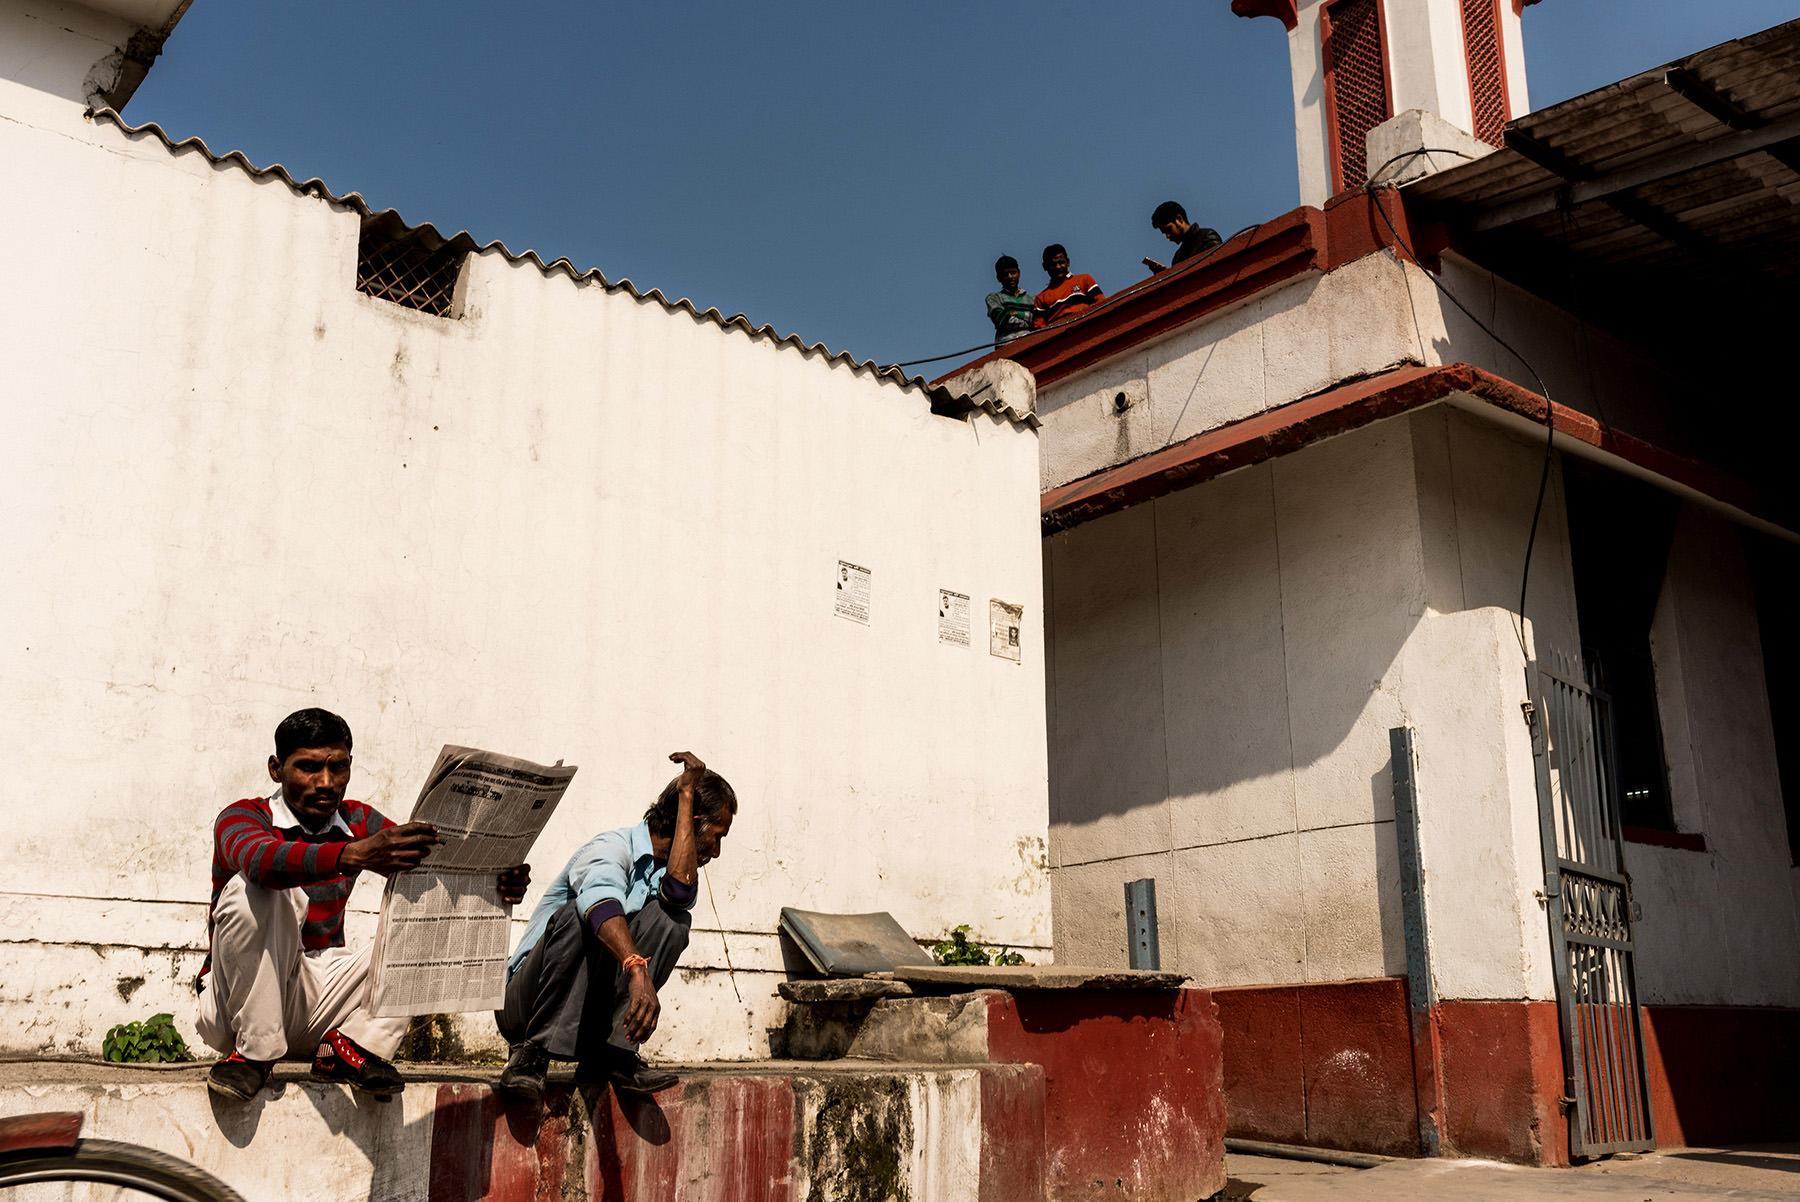 RishikeshStreetPhotography